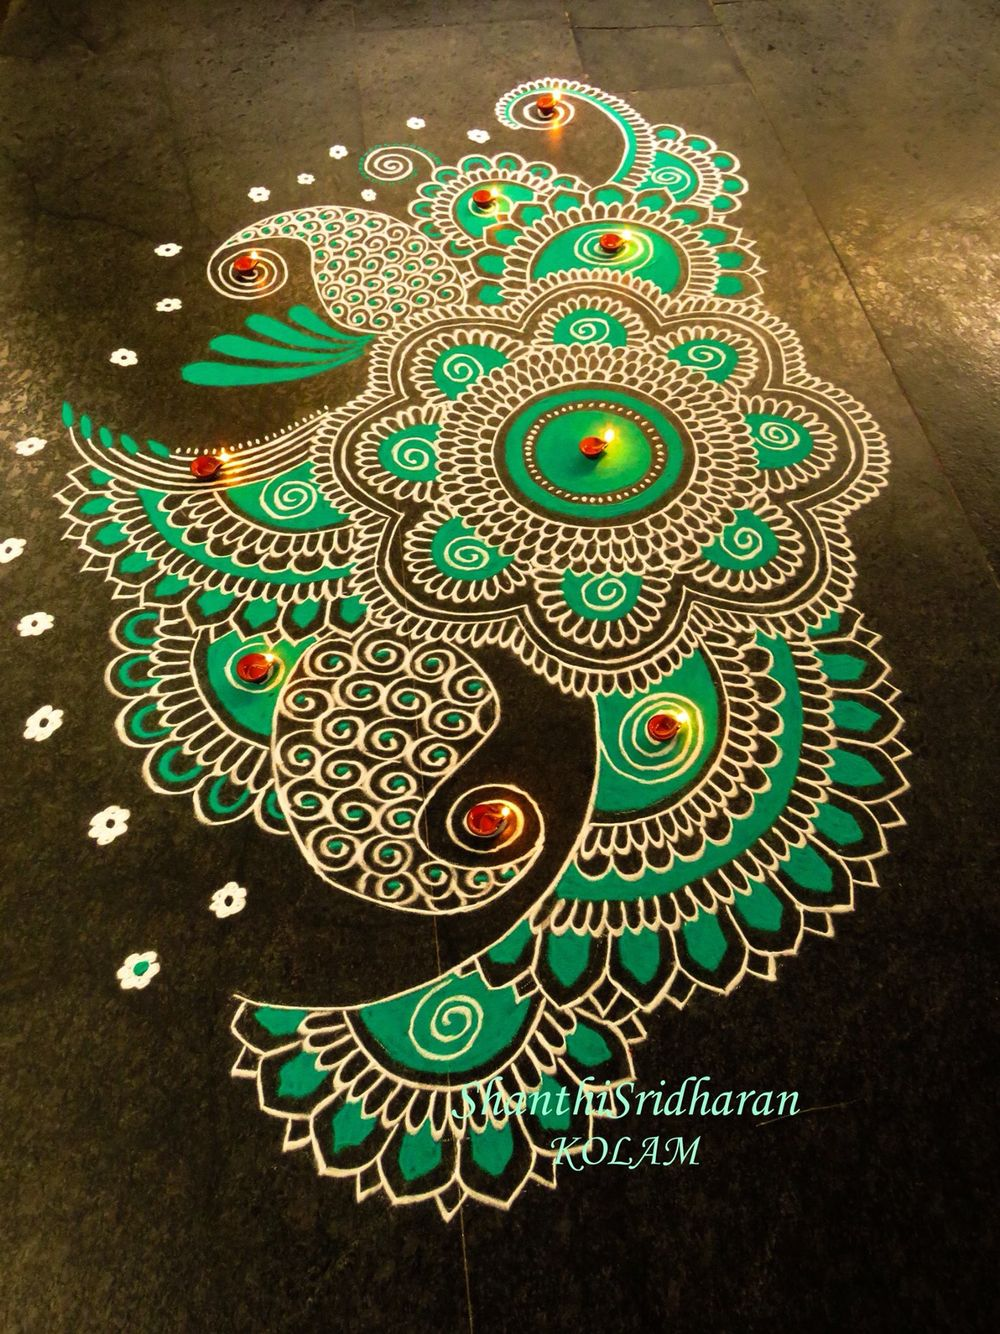 How To Make An Interesting Art Piece Using Tree Branches Ehow Rangoli Designs Flower Rangoli Designs Rangoli Designs For Competition